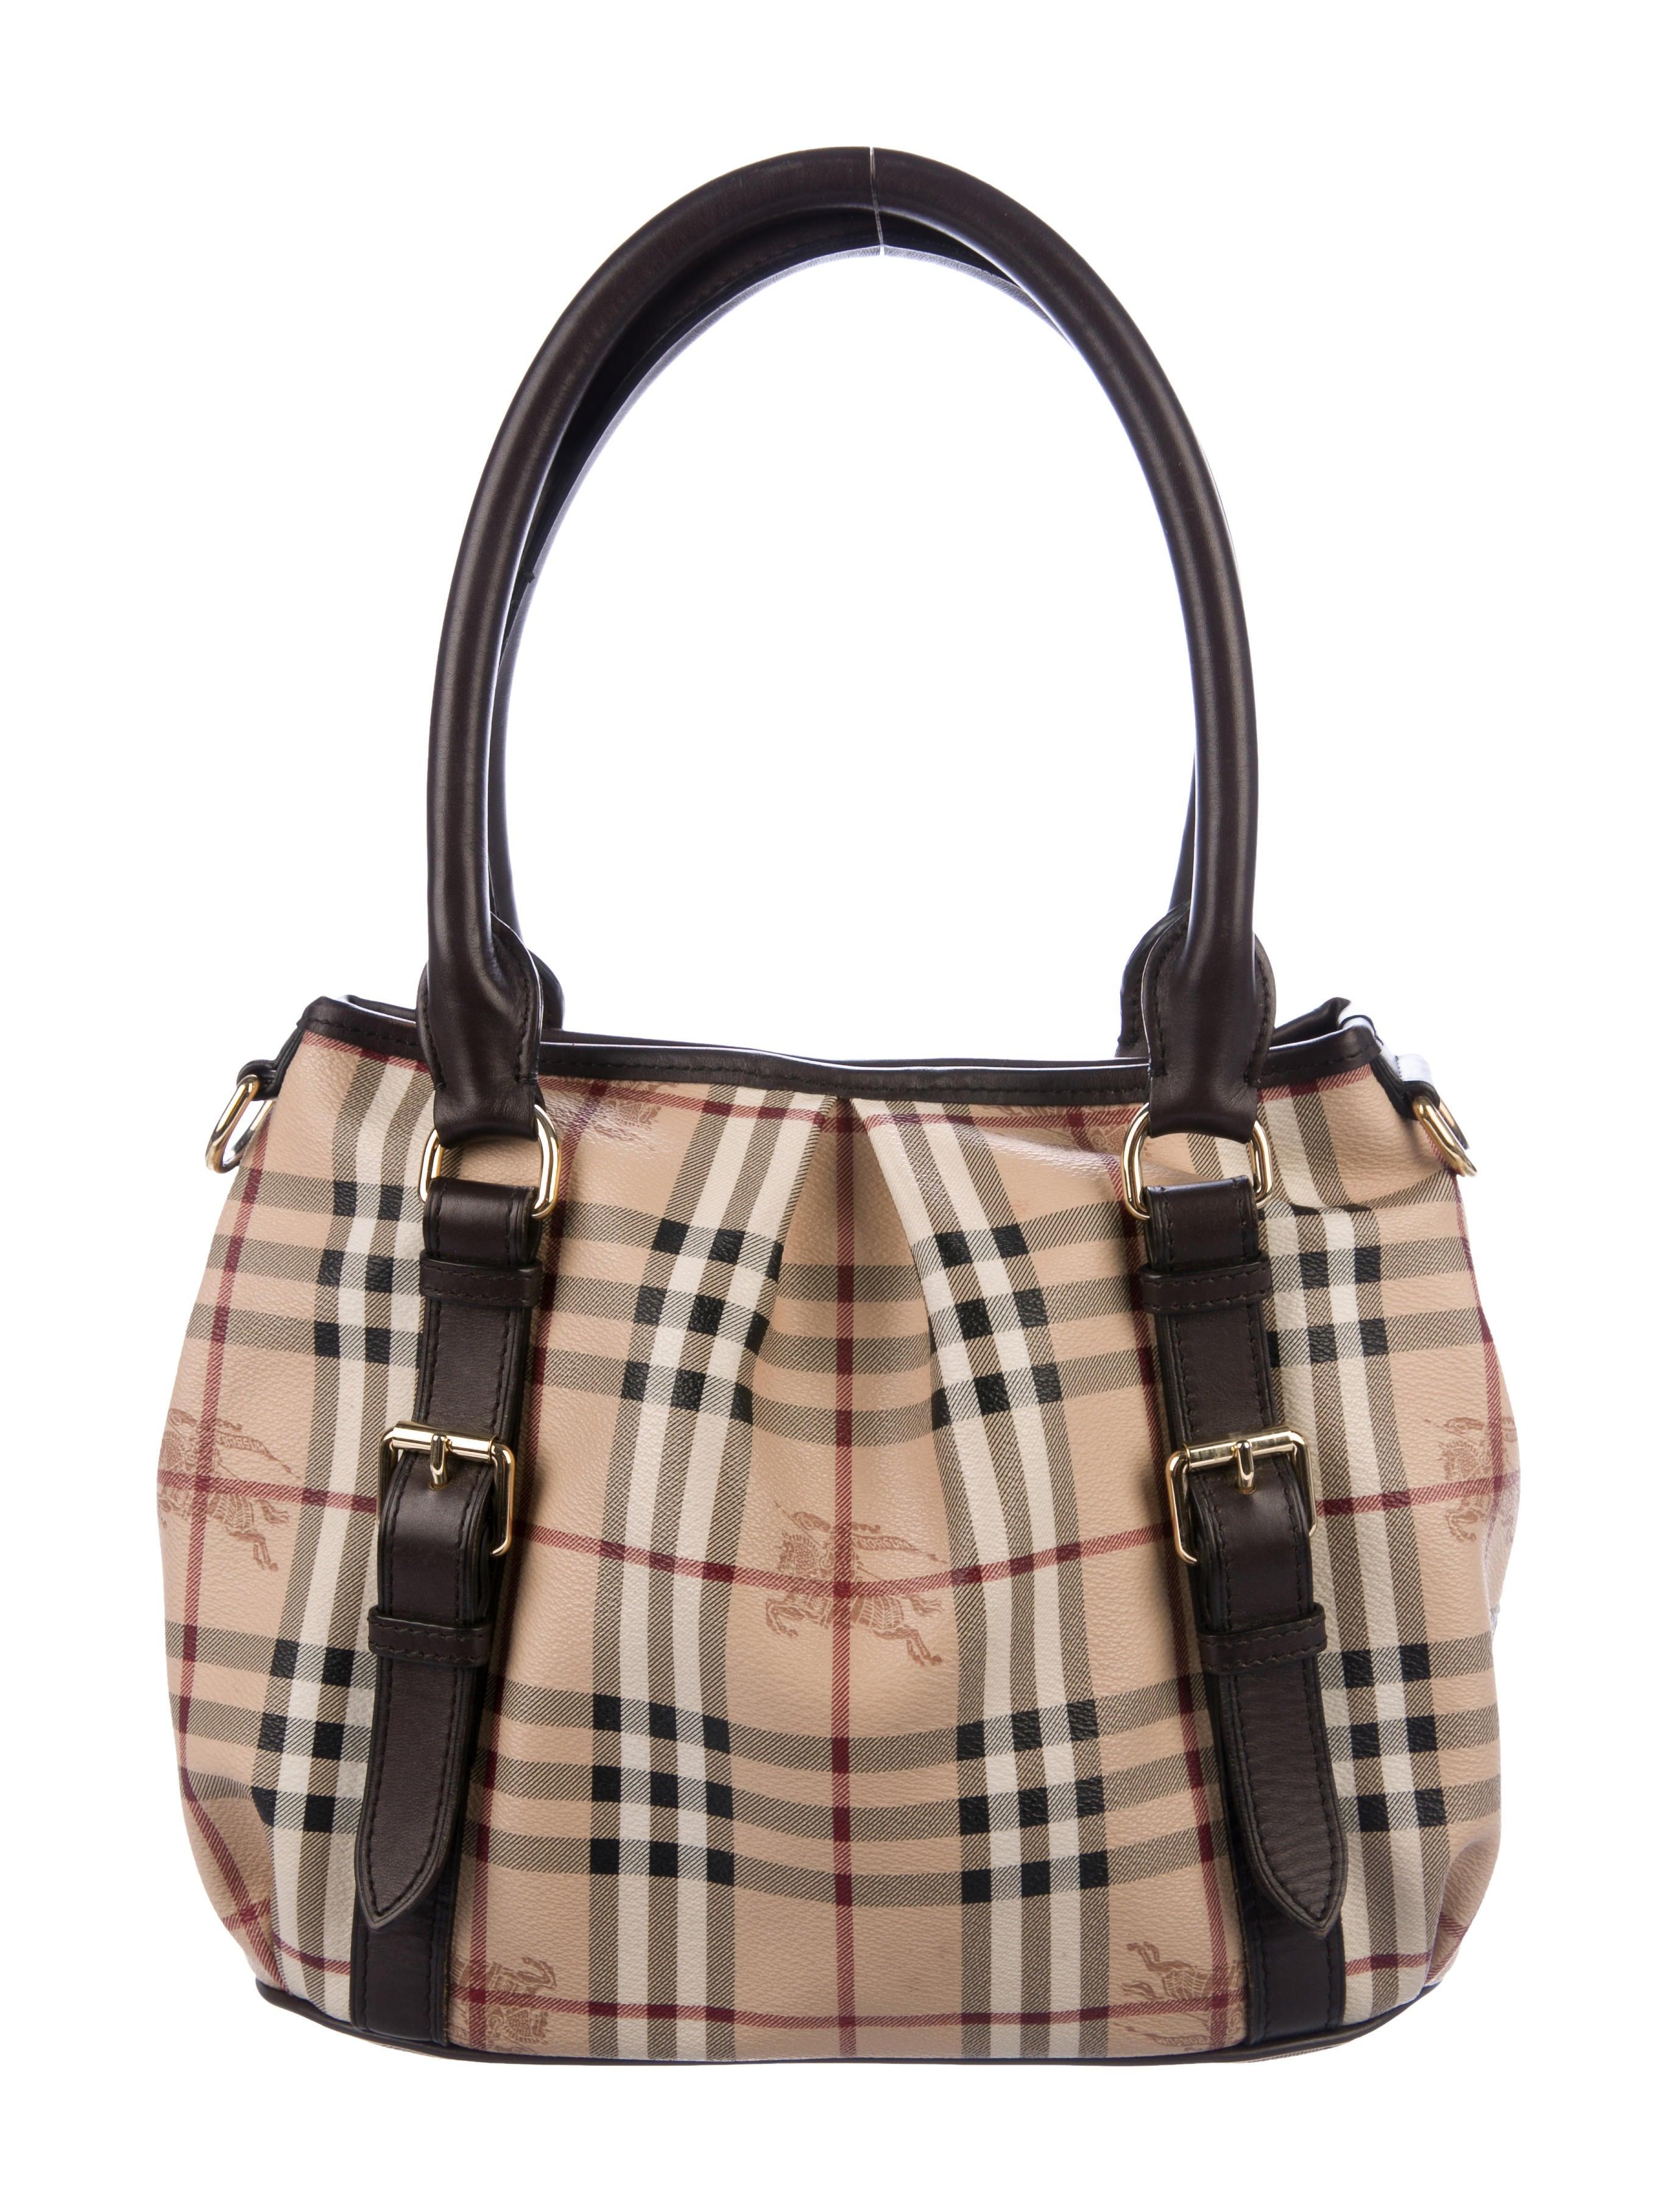 247893d65d38 Burberry Haymarket Check Small Northfield Tote - Handbags ...